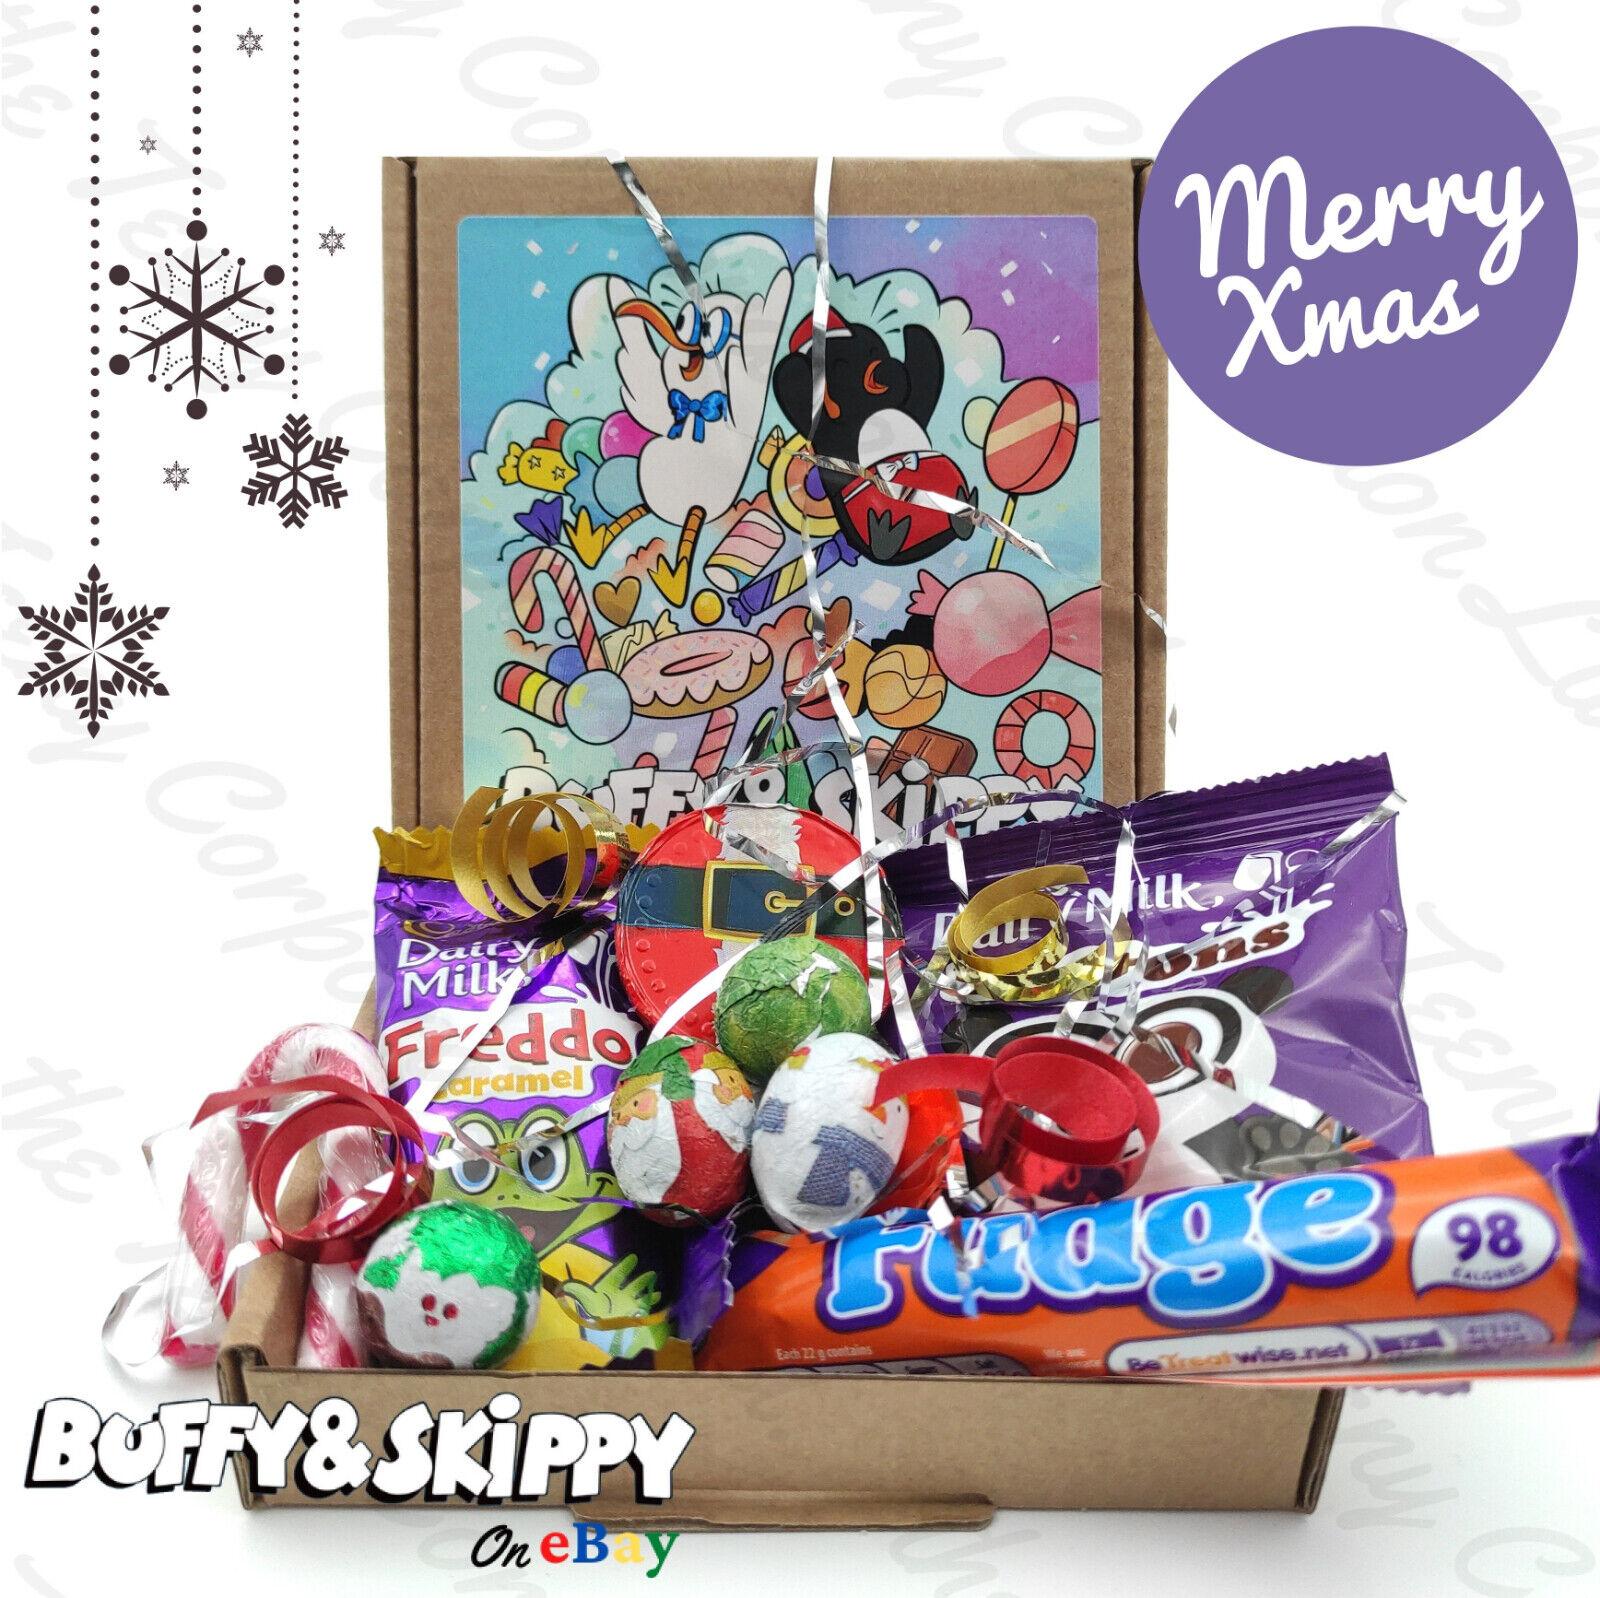 🎄It's Christmas!!🎁